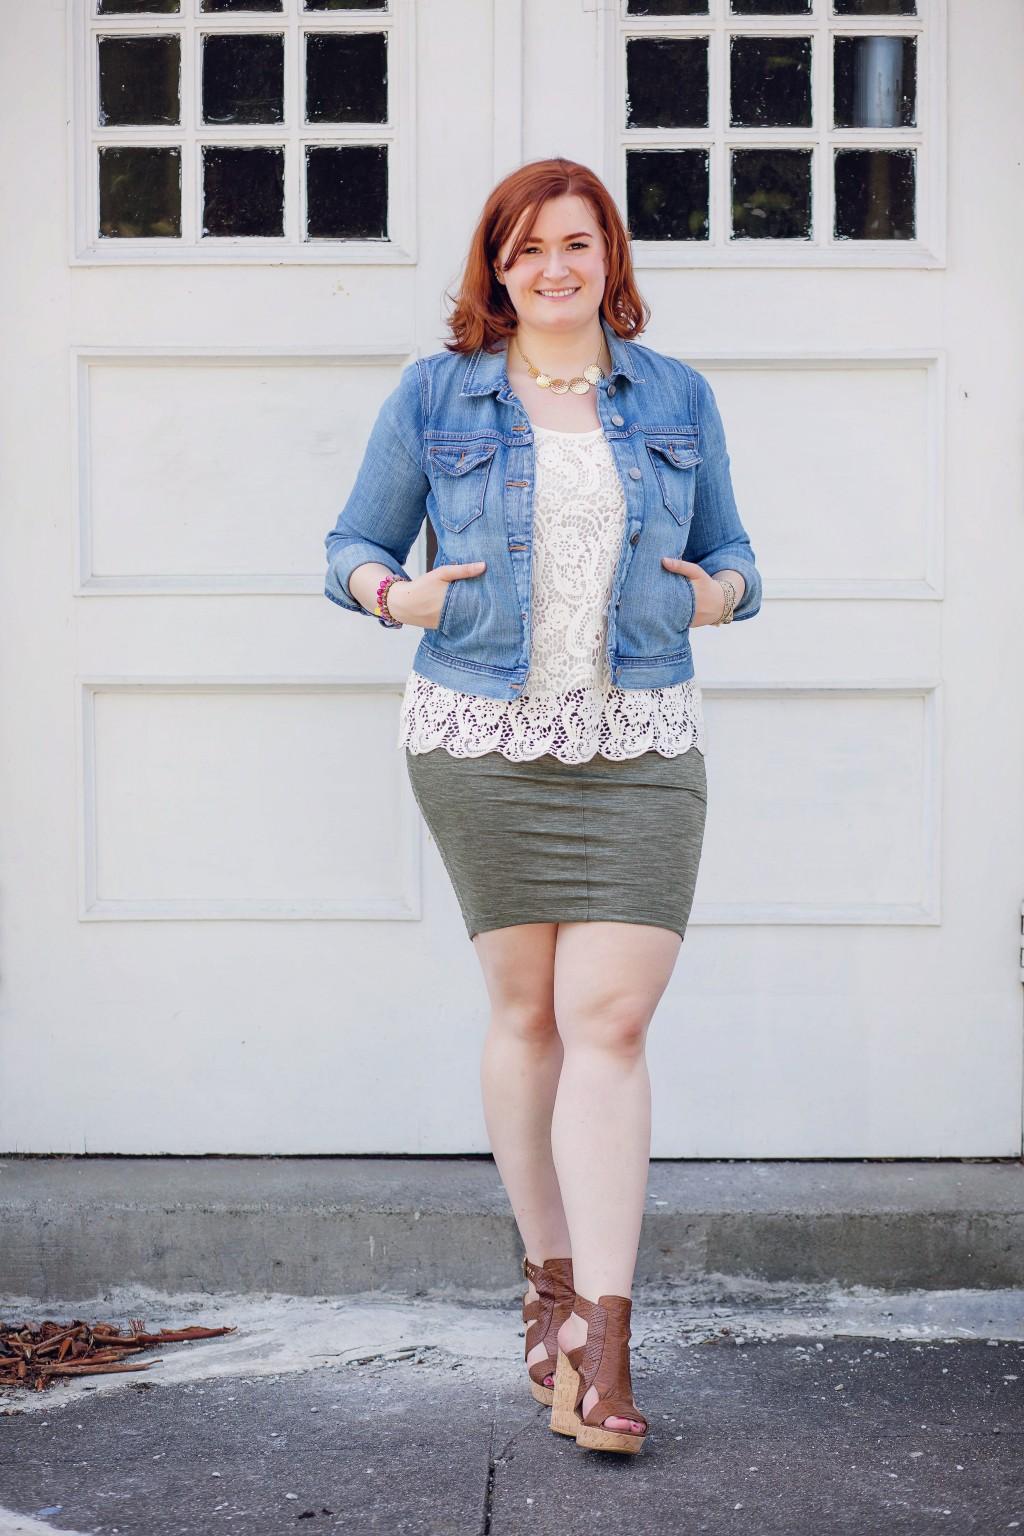 1 - Kate Retherford of All Things Kate in Lululemon Wanderlust Skirt, Stuart Weitzman Wedges, JCrew Denim Jacket, Cabi Lace Top